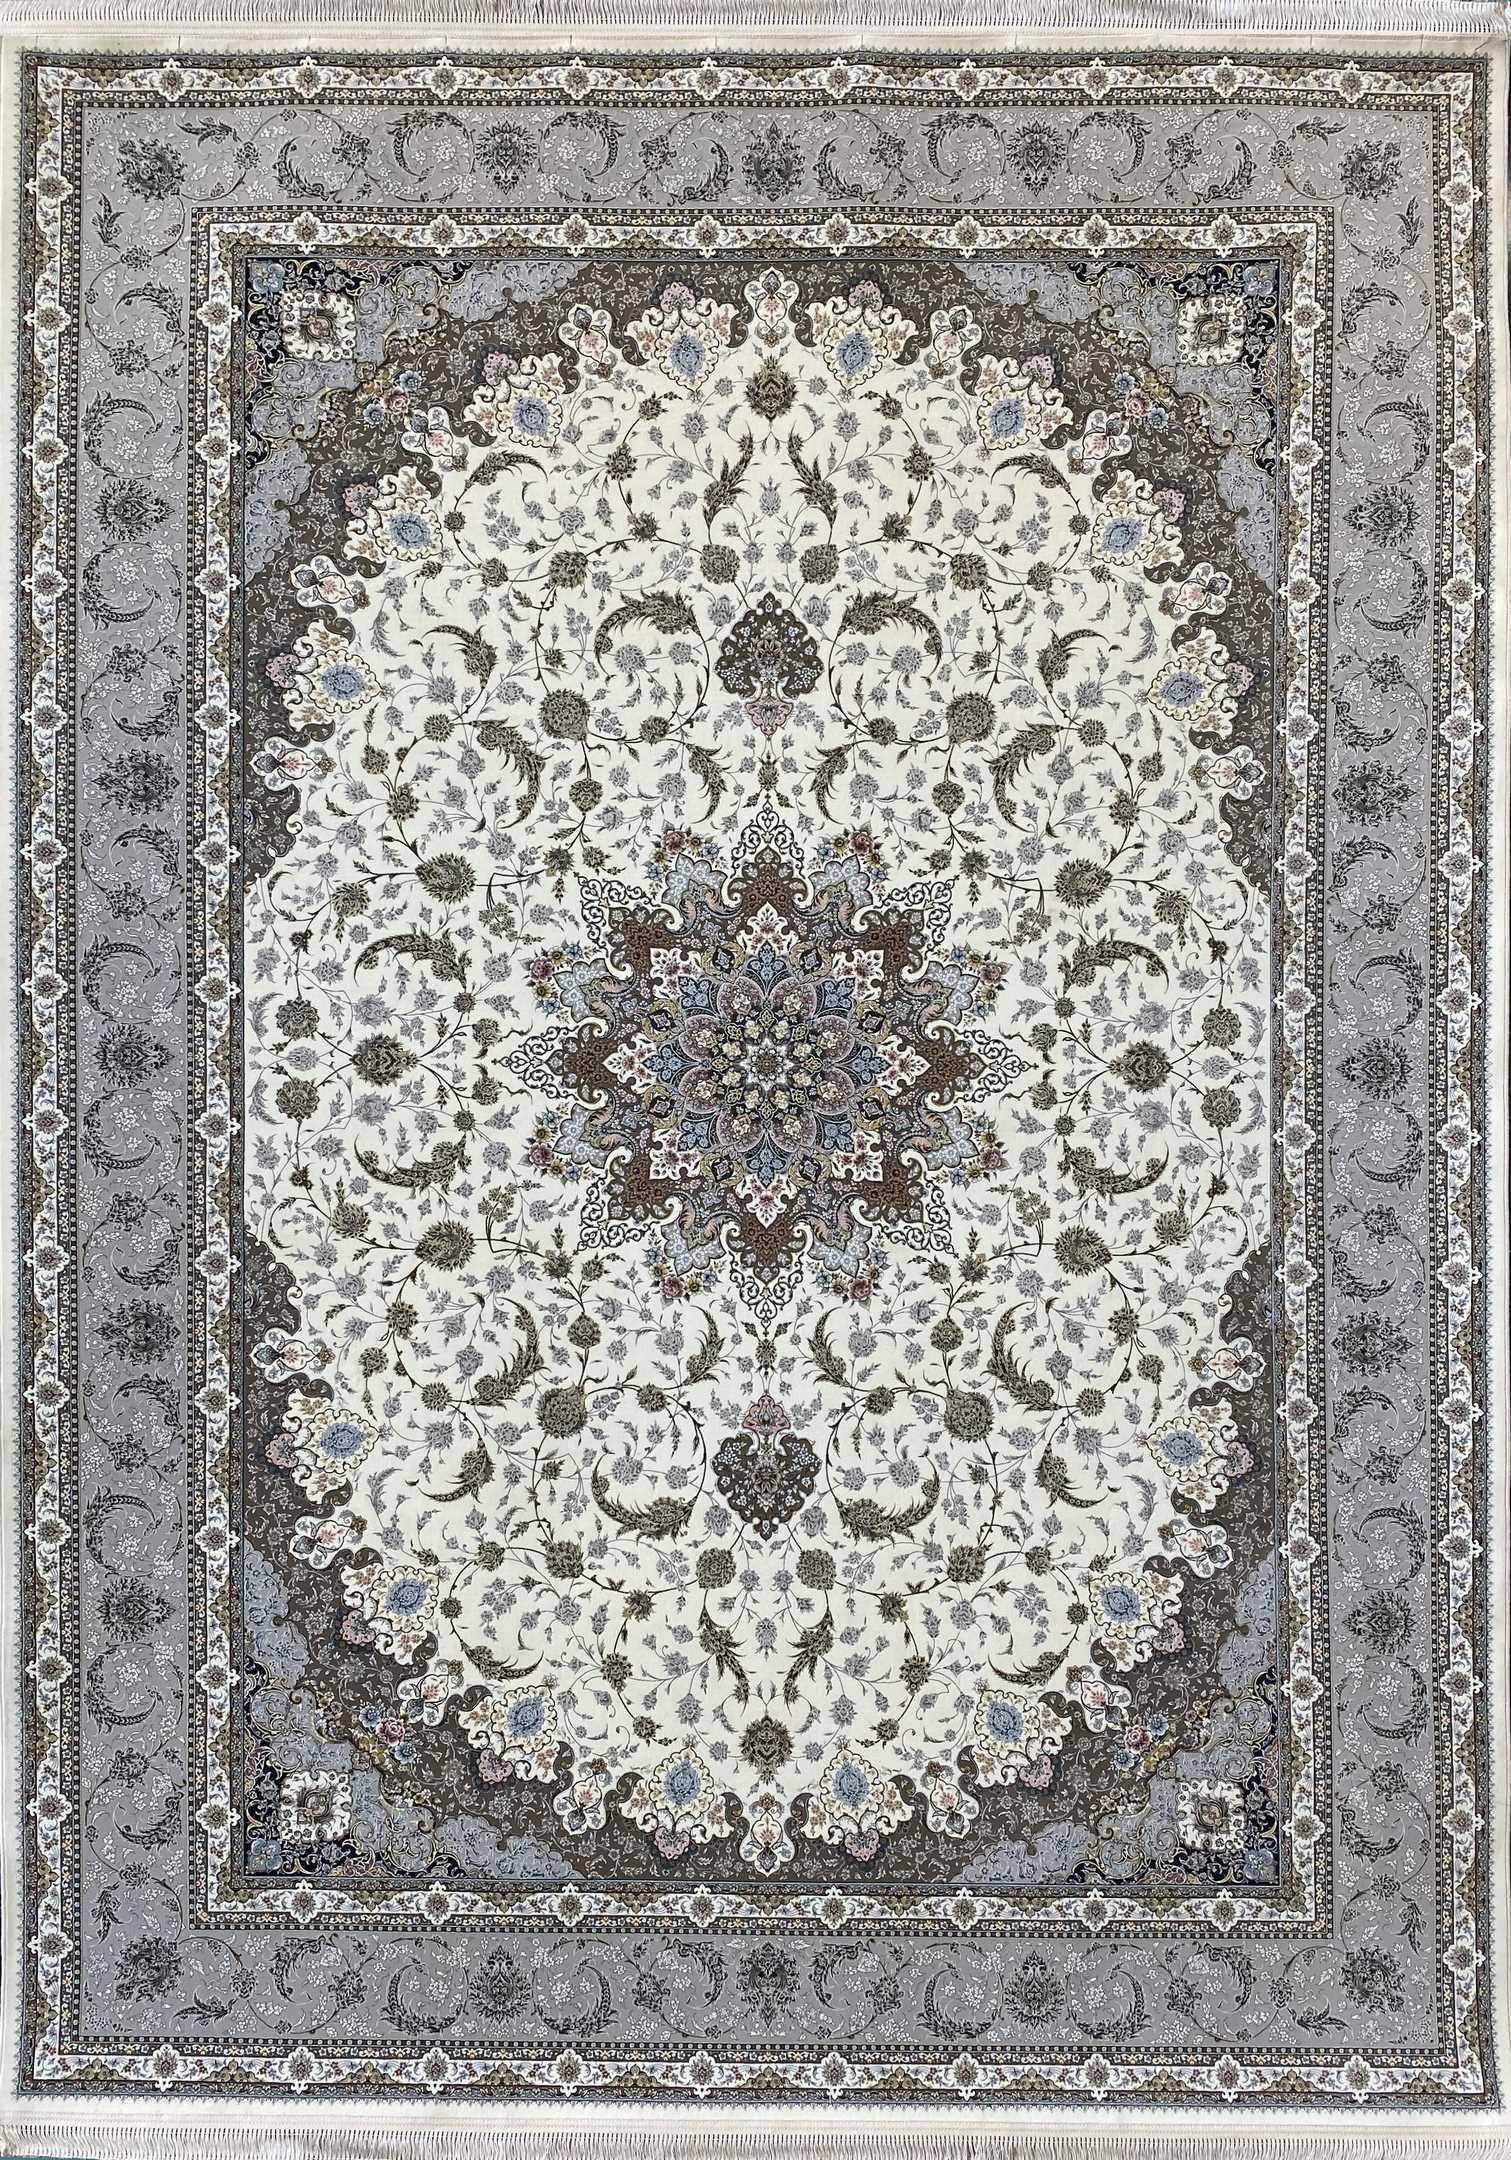 فرش کاشان -نقشه اصفهان ۱۵۰۰ شانه کرم گلبرجسته